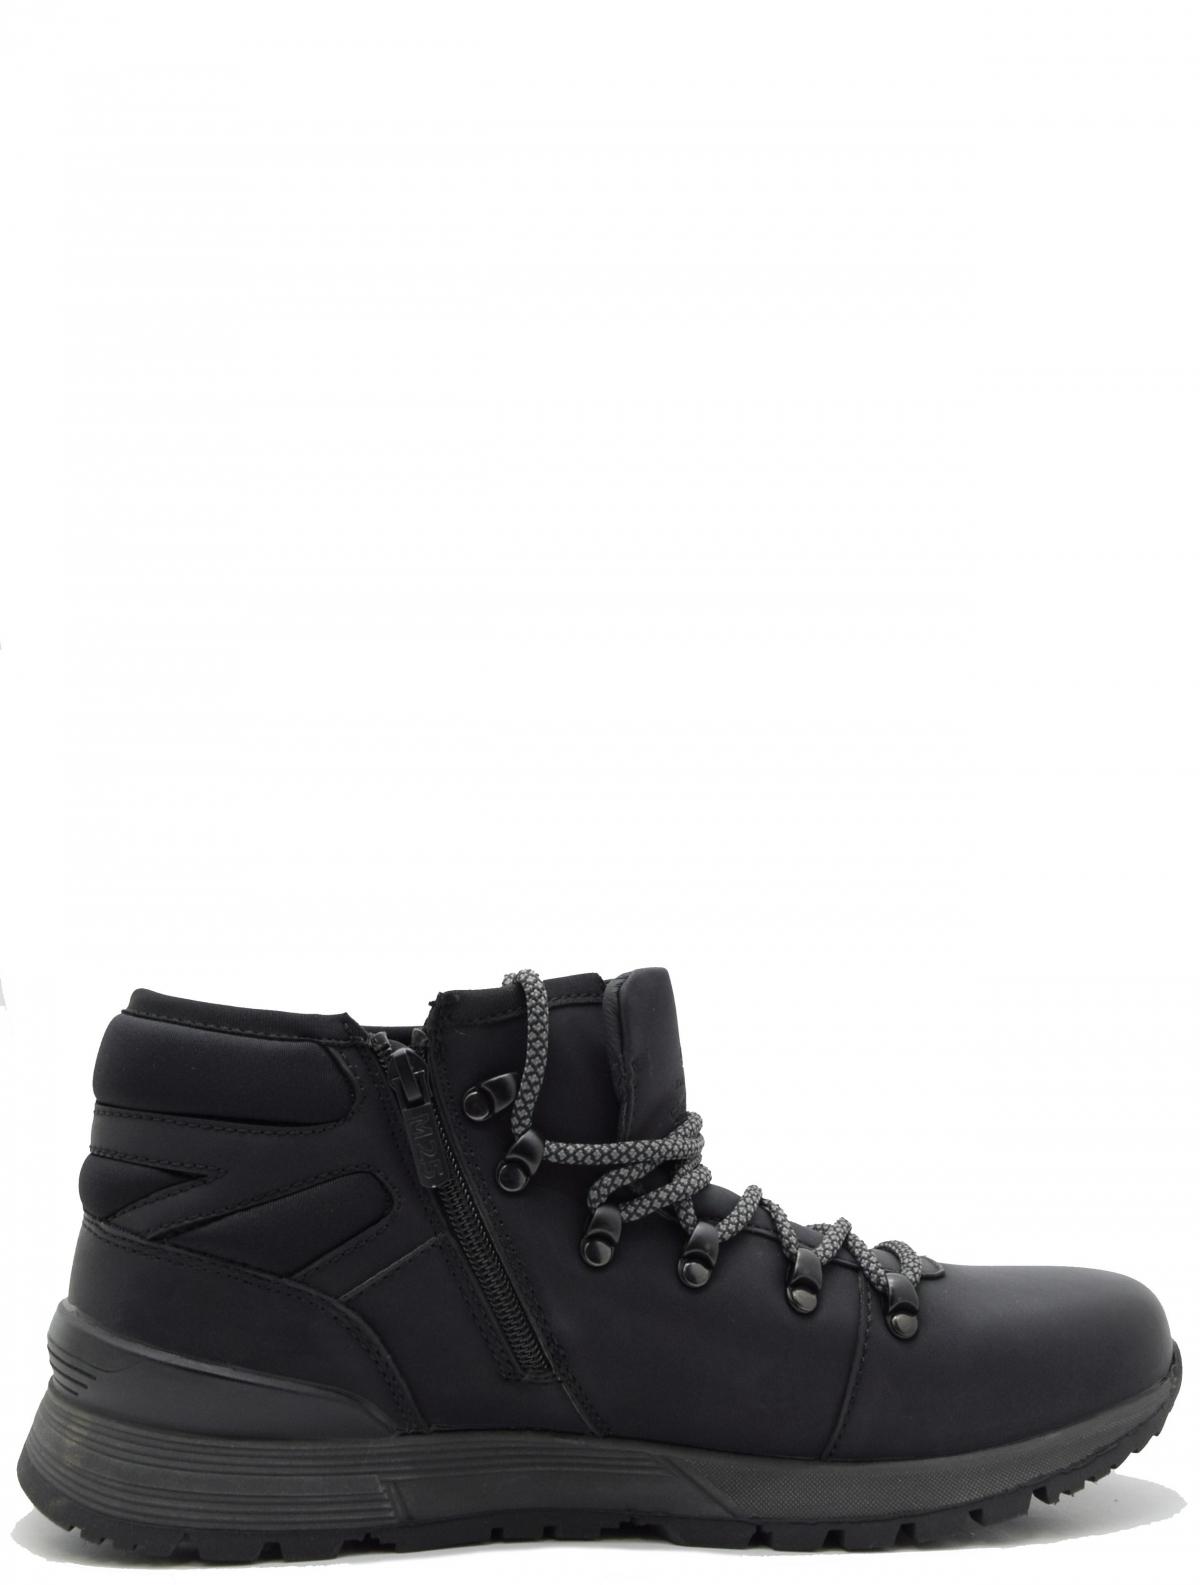 M25 B6291-1 мужские ботинки